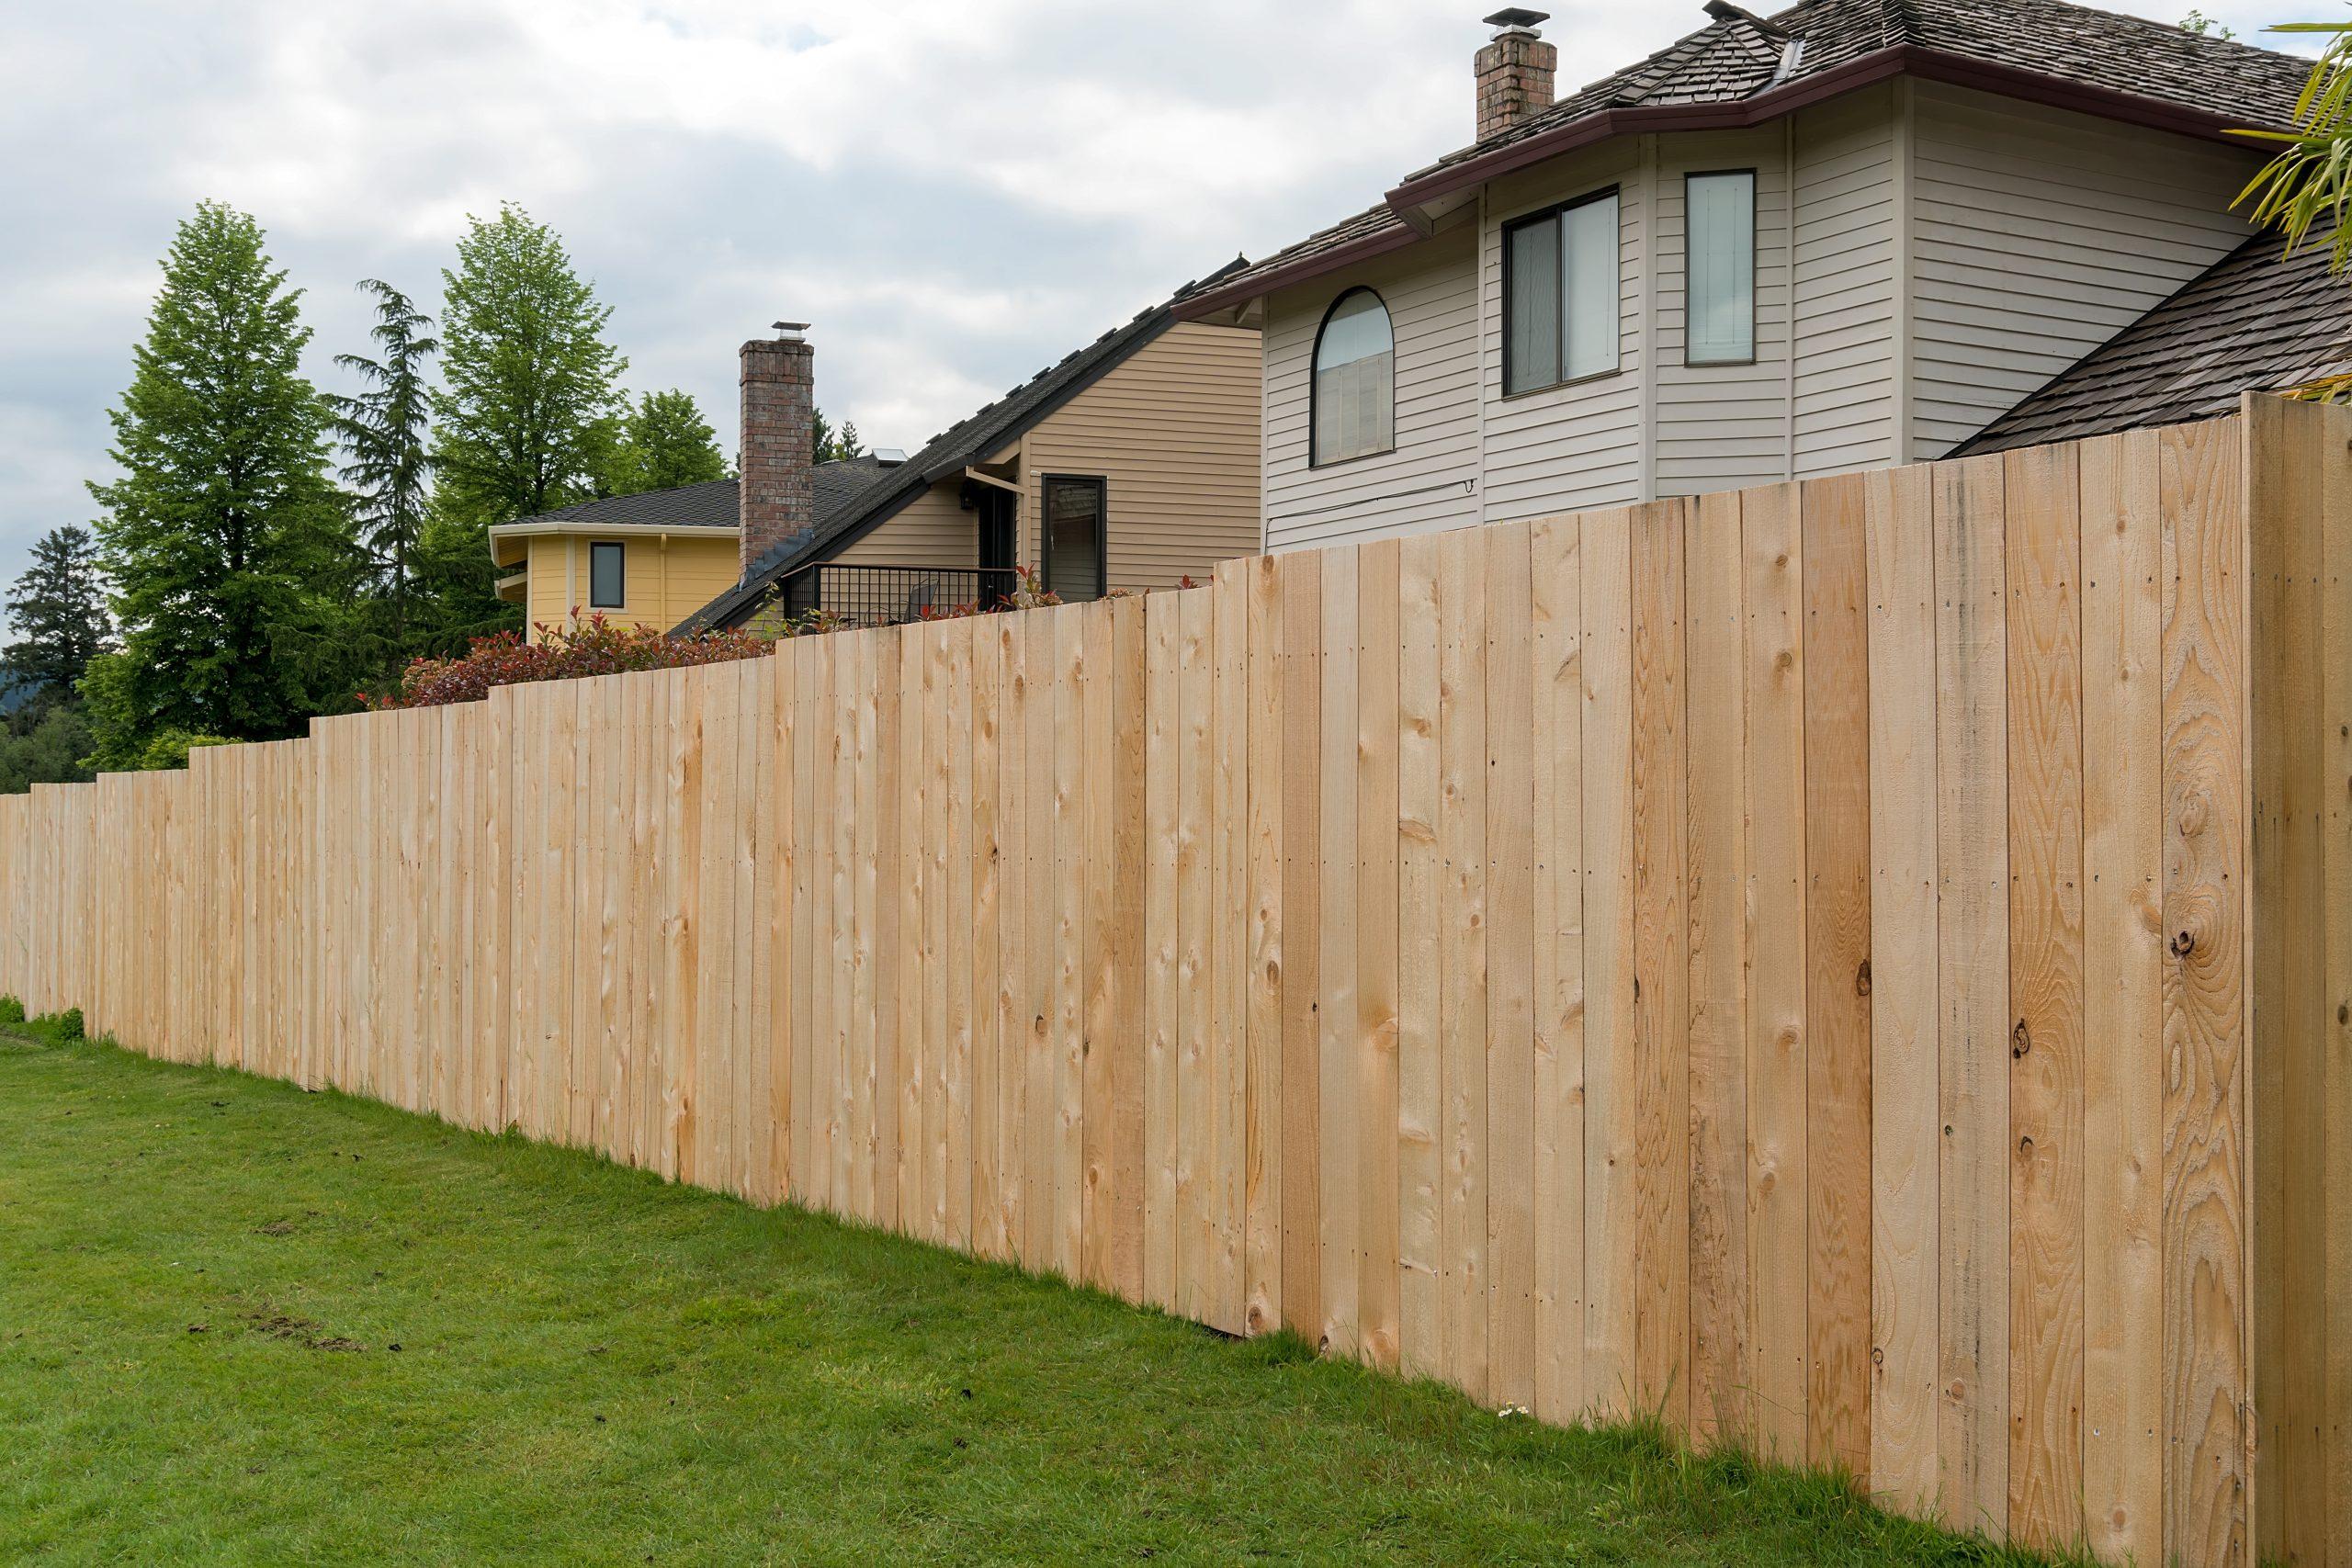 cedar fence little rock arkansas fencing contractor builder contractors little rock arkansas north little rock sherwood cabot jacksvonville ar